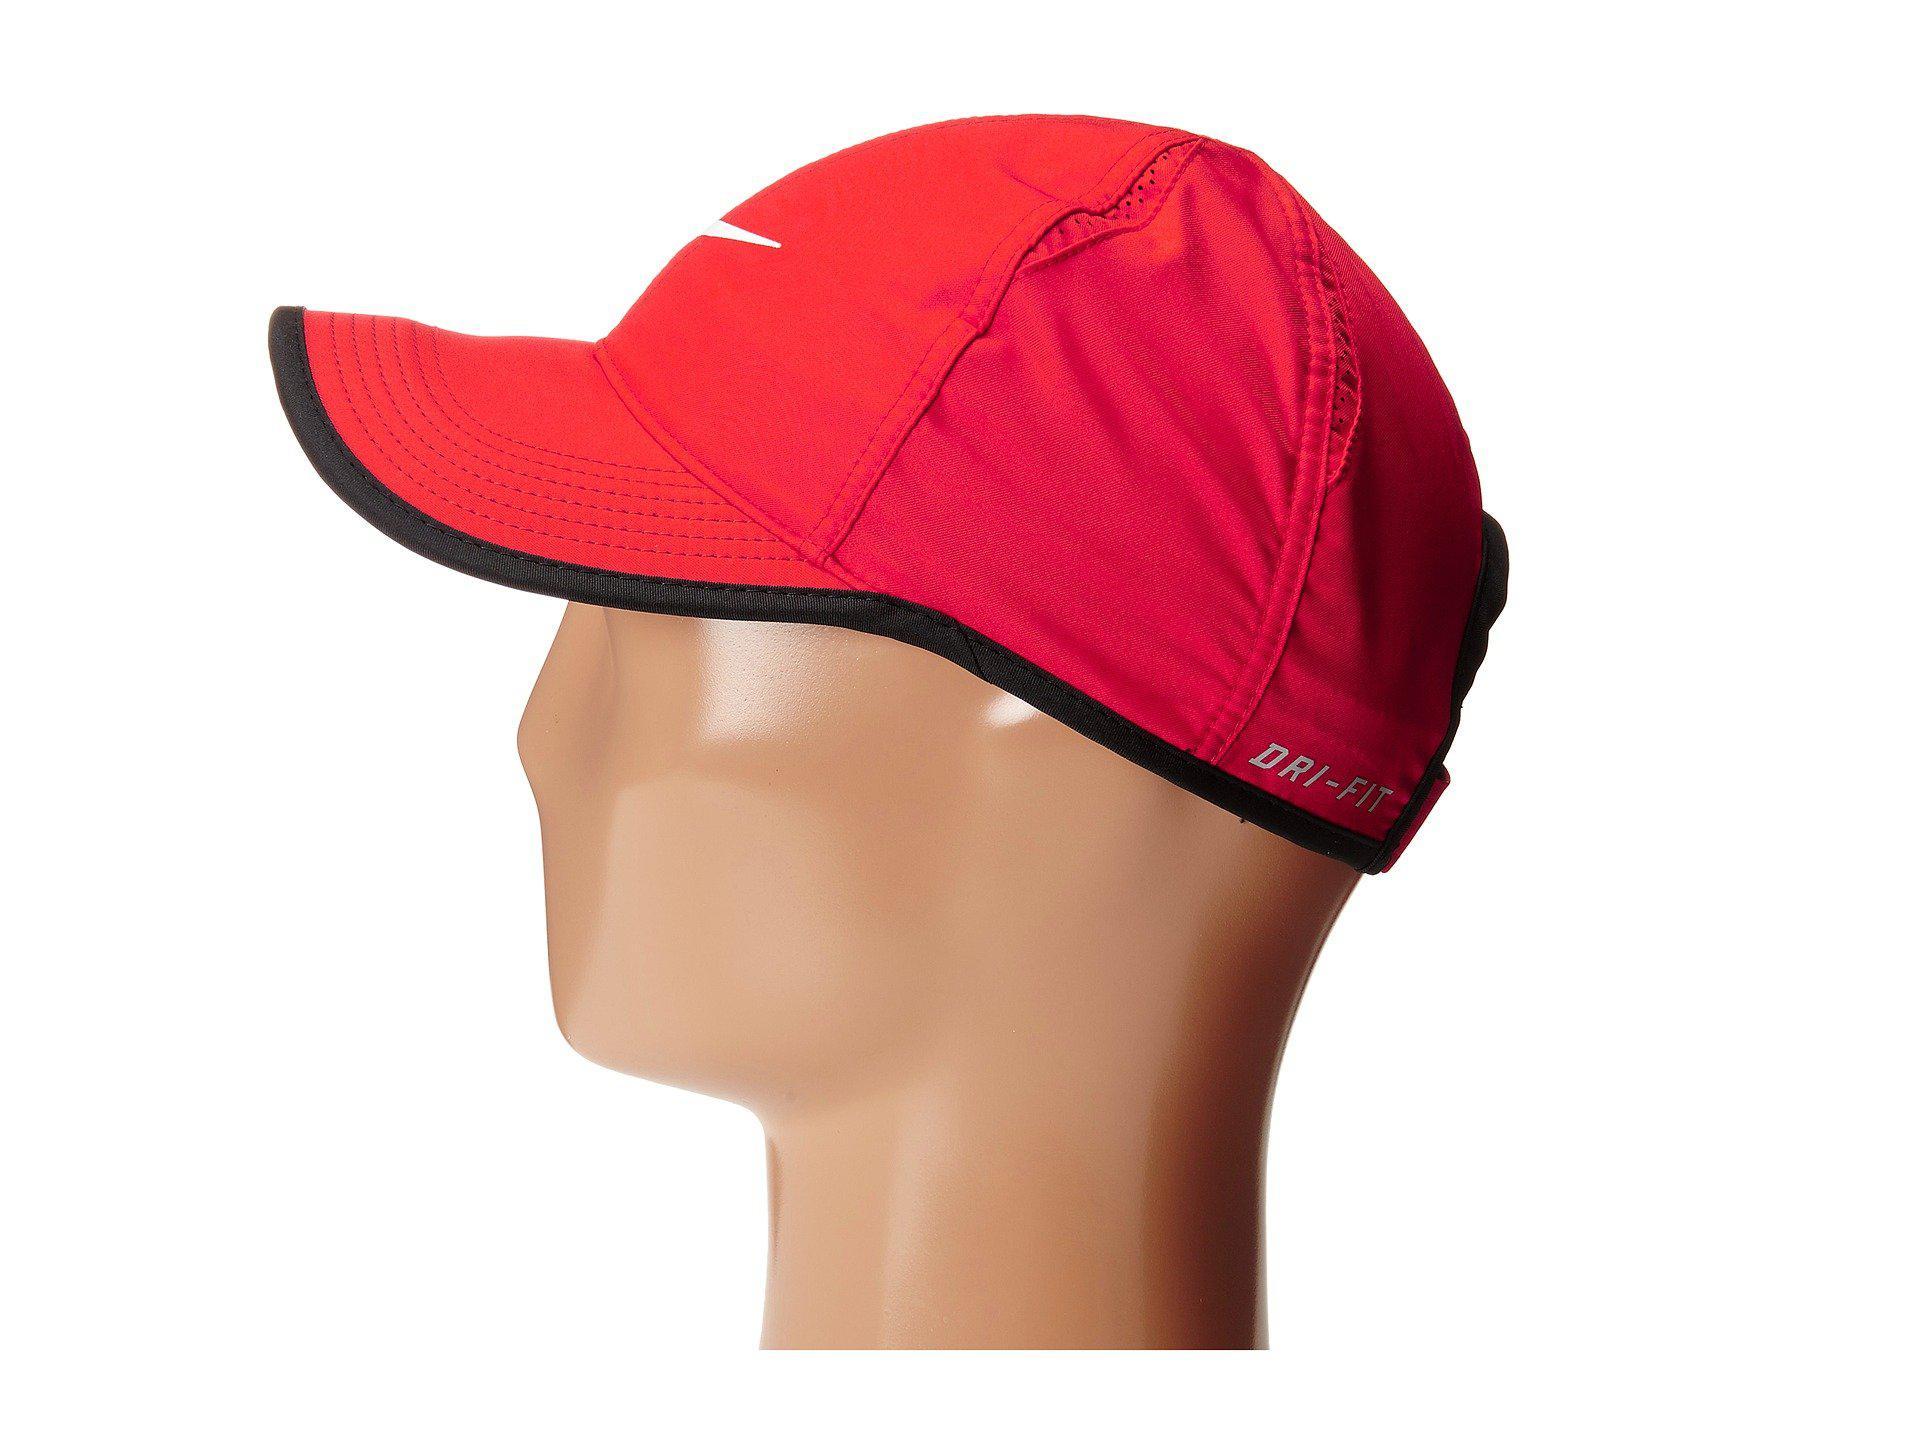 1aedae379d1c49 Nike Featherlight Cap (black/white) Caps in Red for Men - Lyst